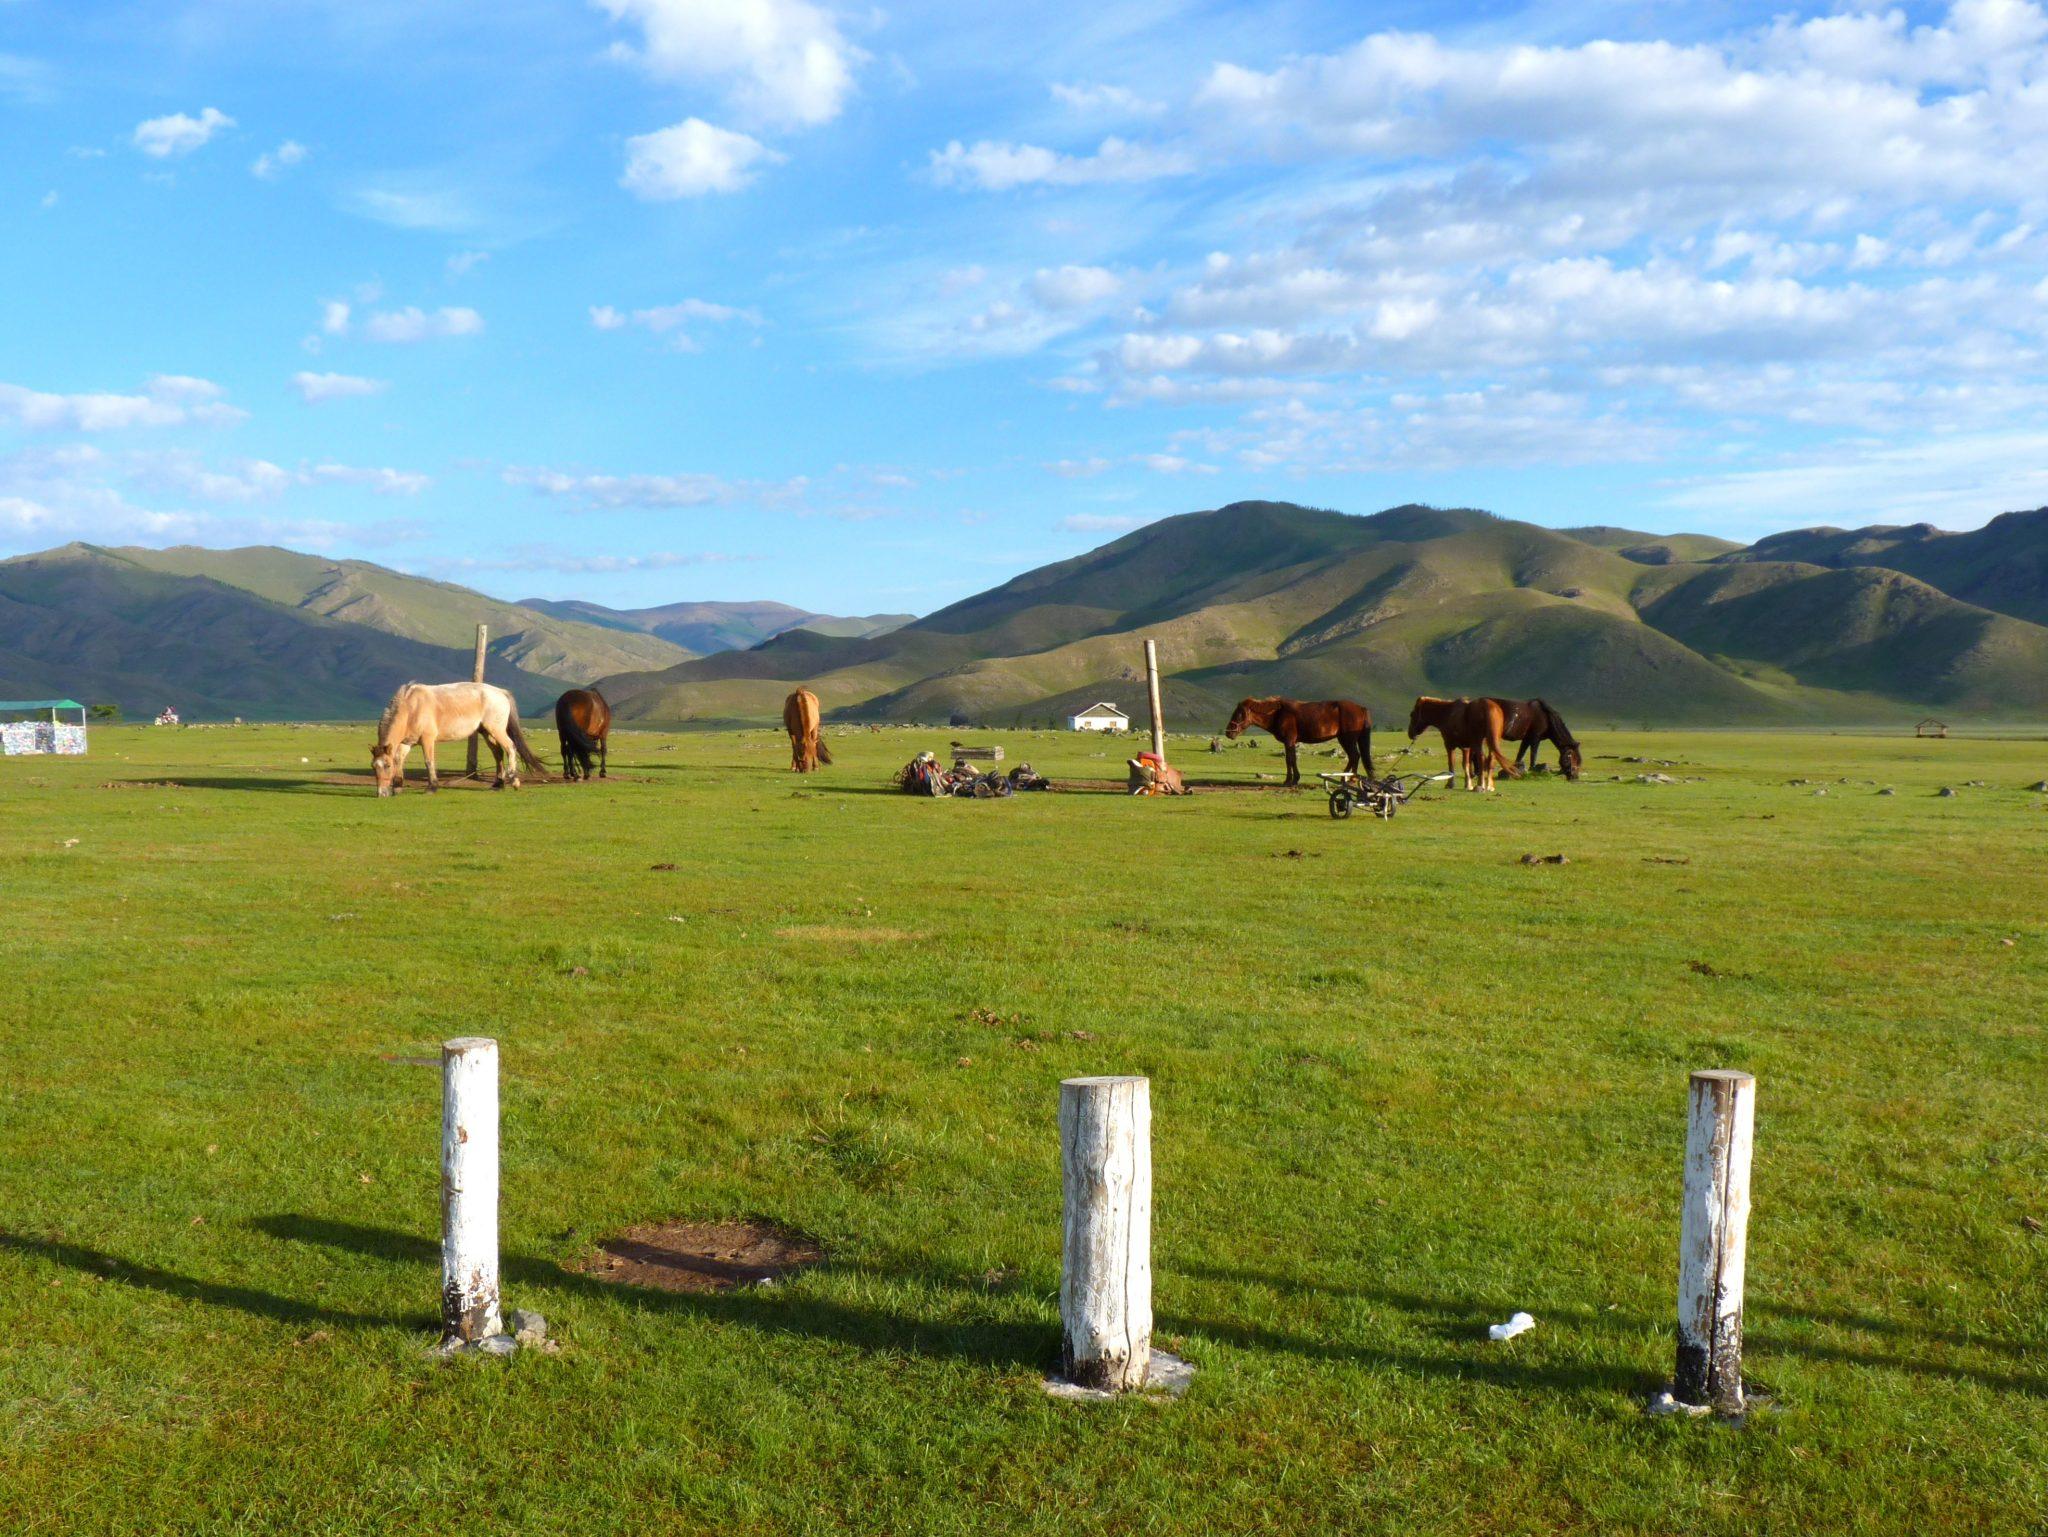 Cavalos 01 Mongólia Mundo Indefinido